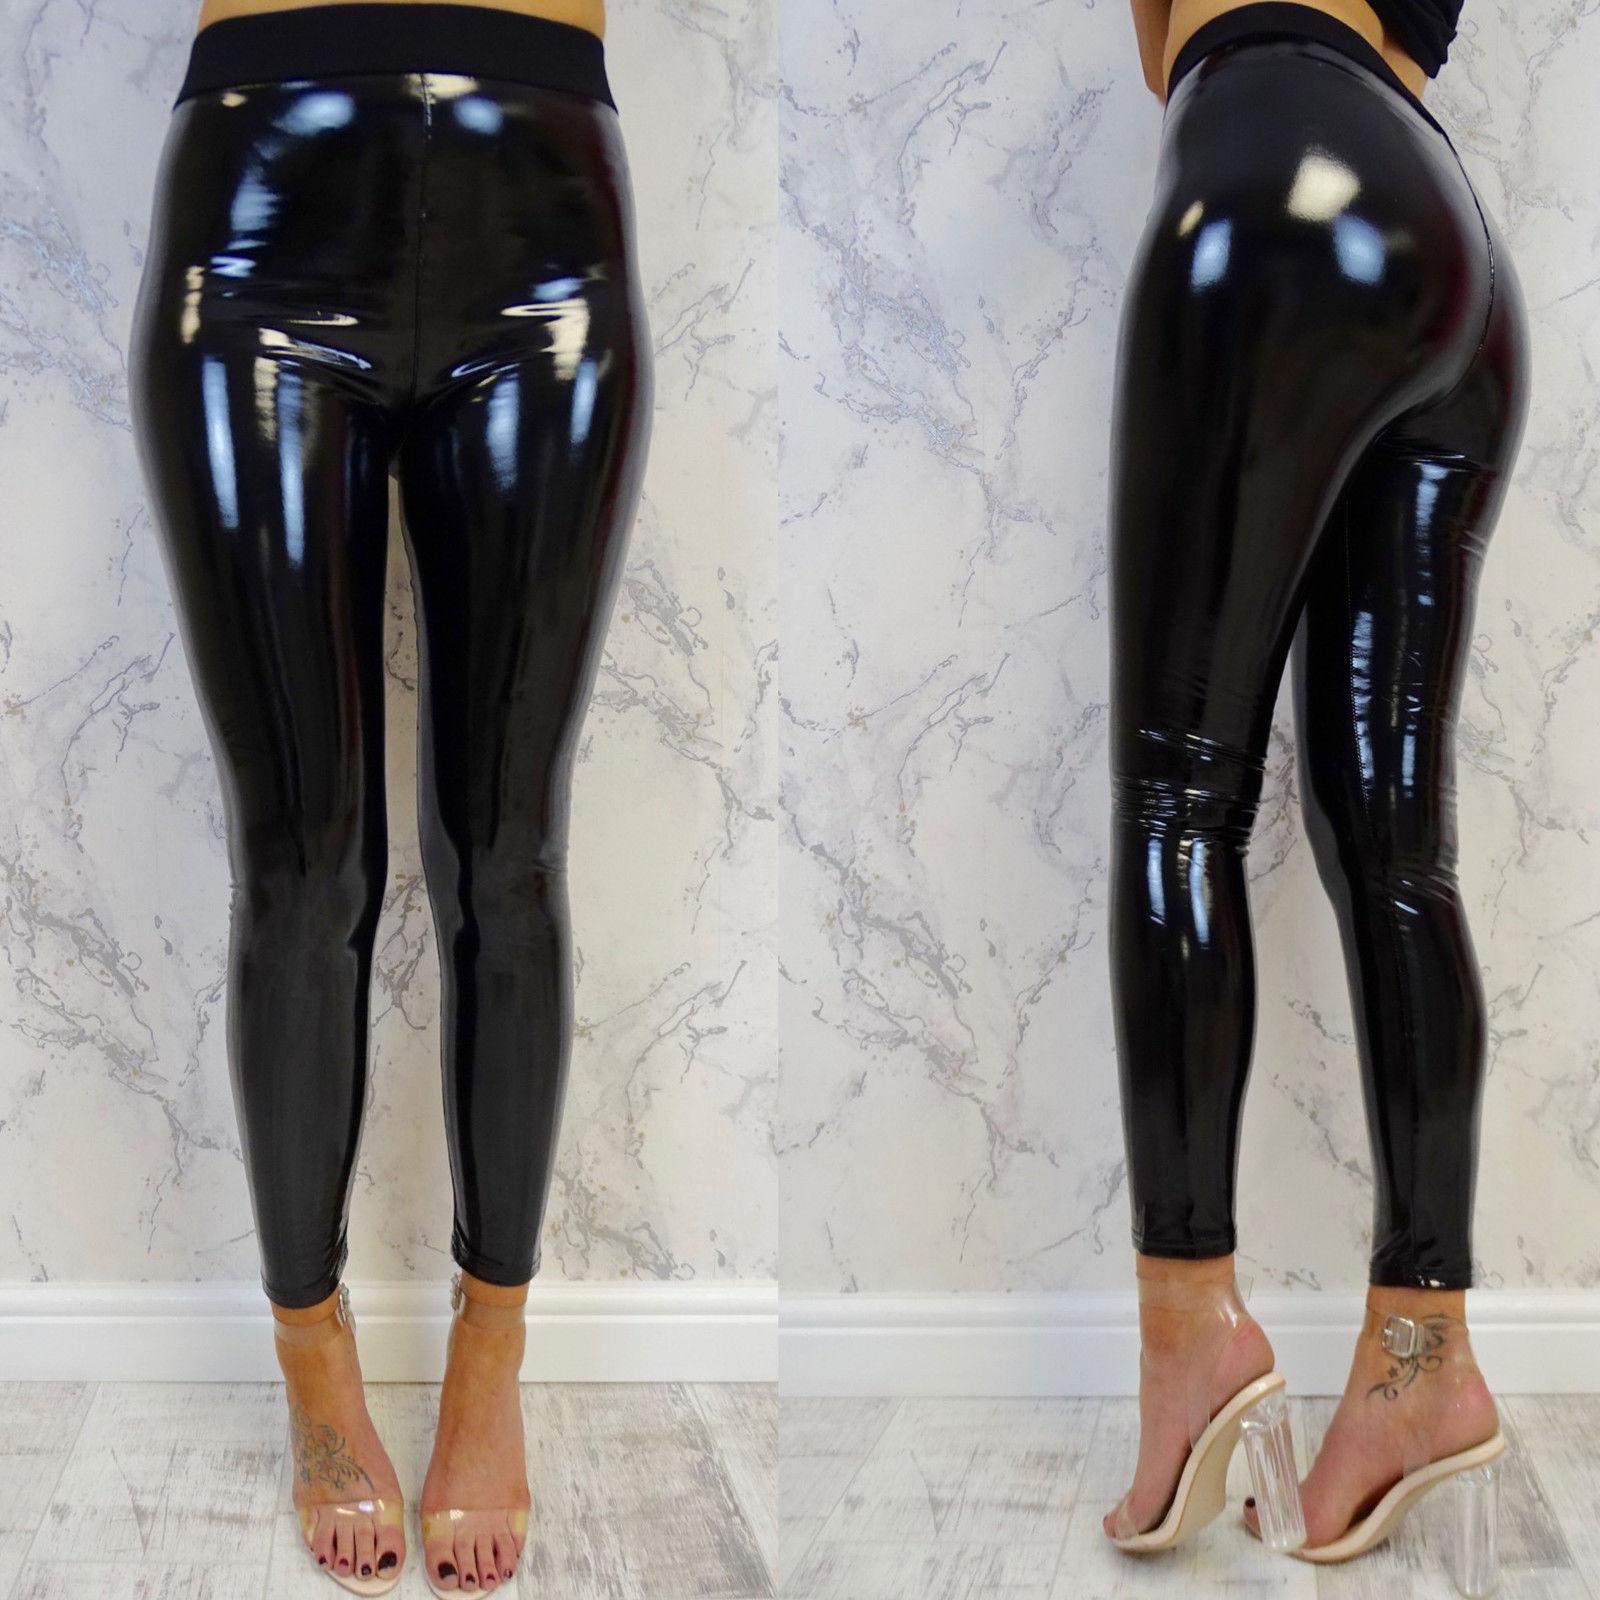 Pants Women High Waist PU Leather Pant Black Leggings Female Shinny Stretch Pencil Pants Elastic Trousers Female Clothes